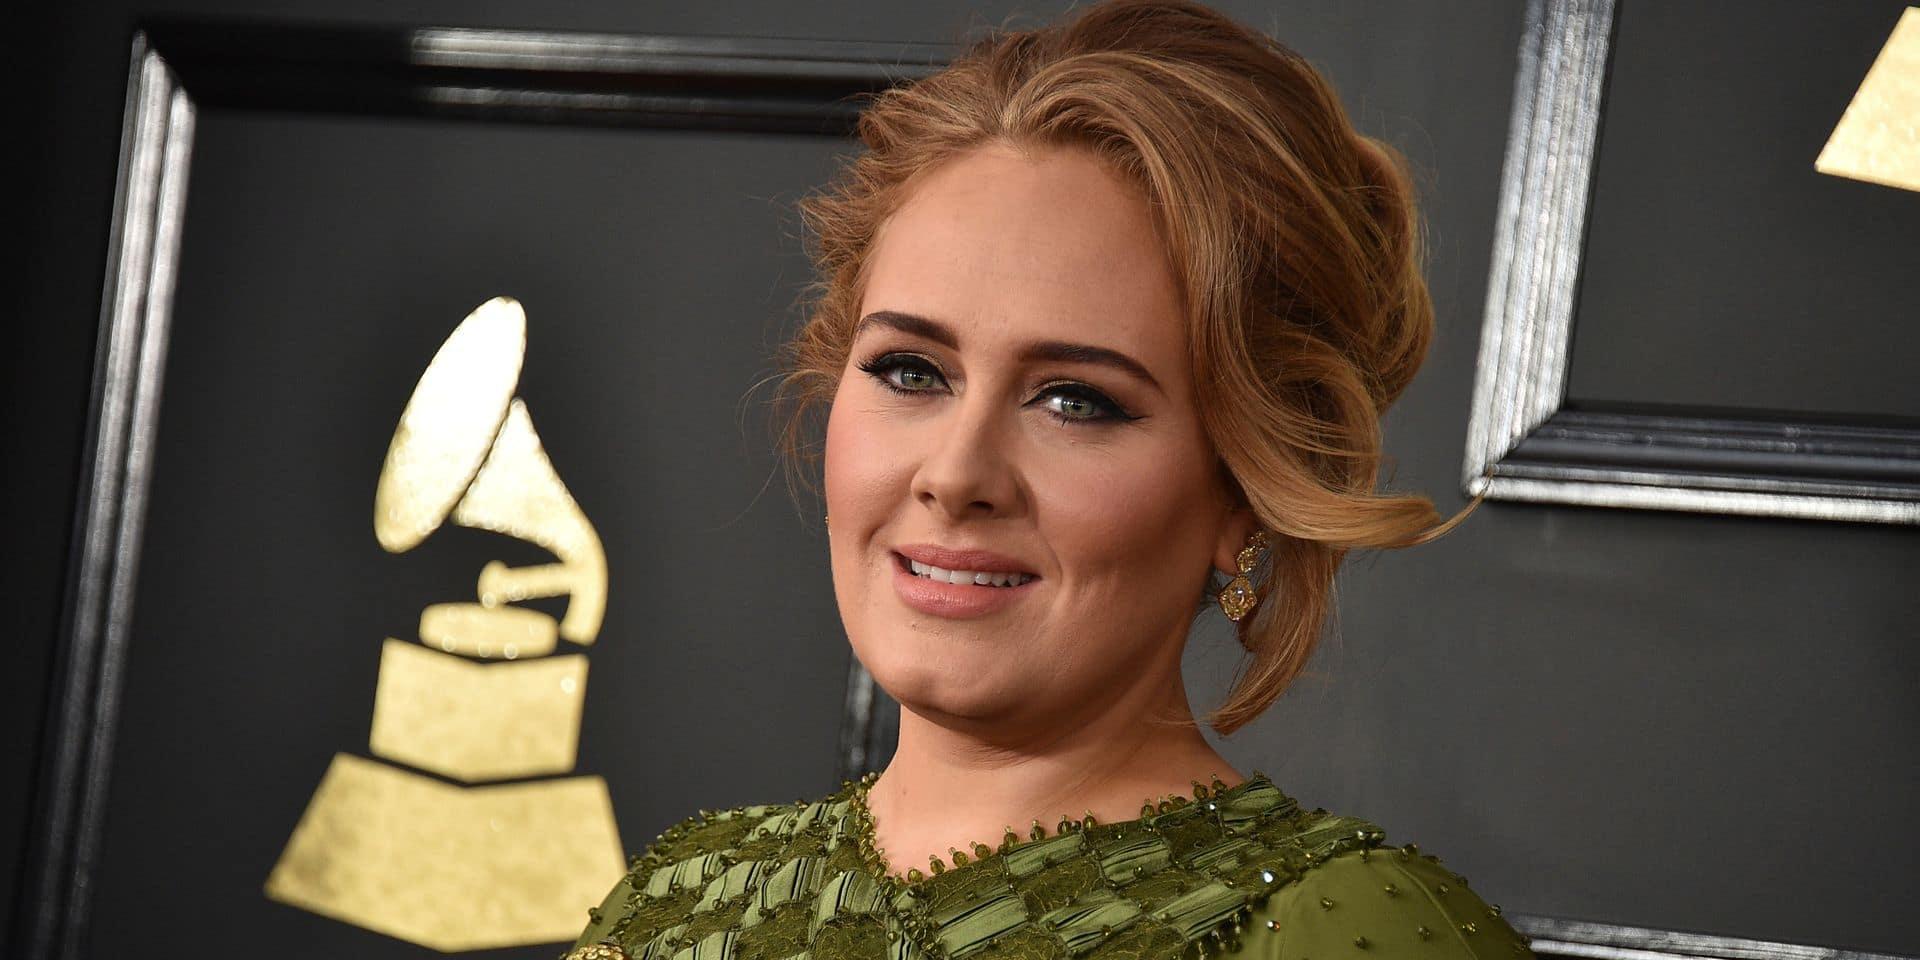 La chanteuse Adele se sépare de son mari